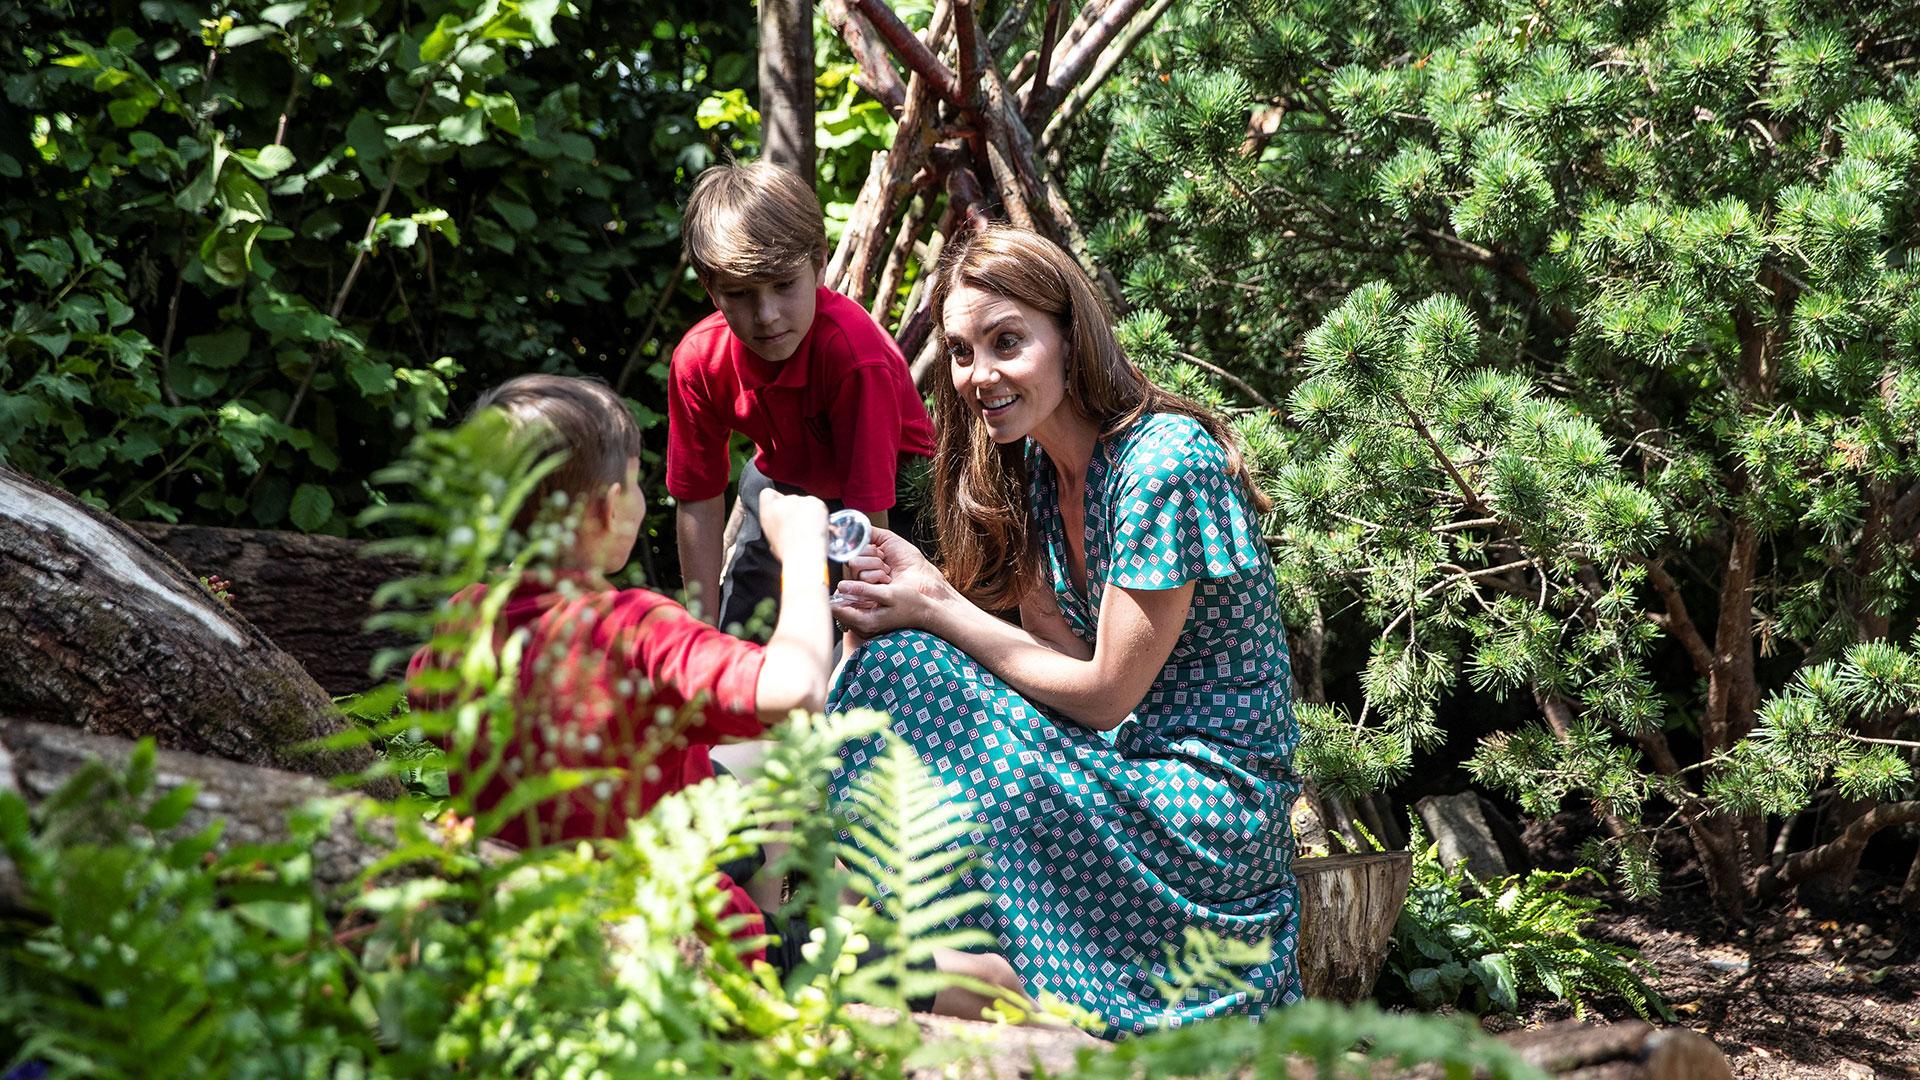 La Duquesa tiene una agenda comprometida con la primera infancia